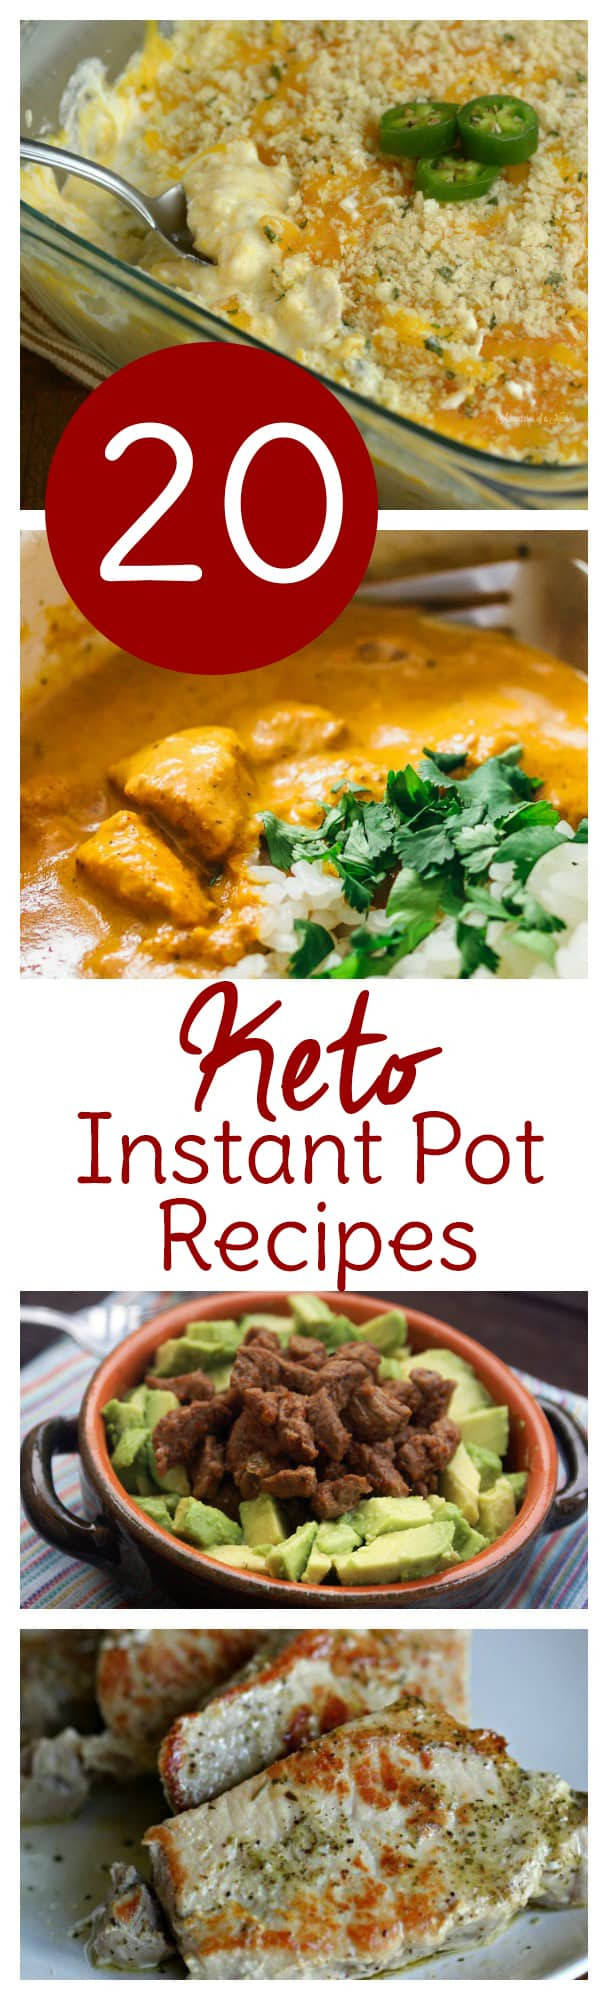 Insta Pot Keto Recipes  20 Instant Pot Keto Recipes to Make This Week